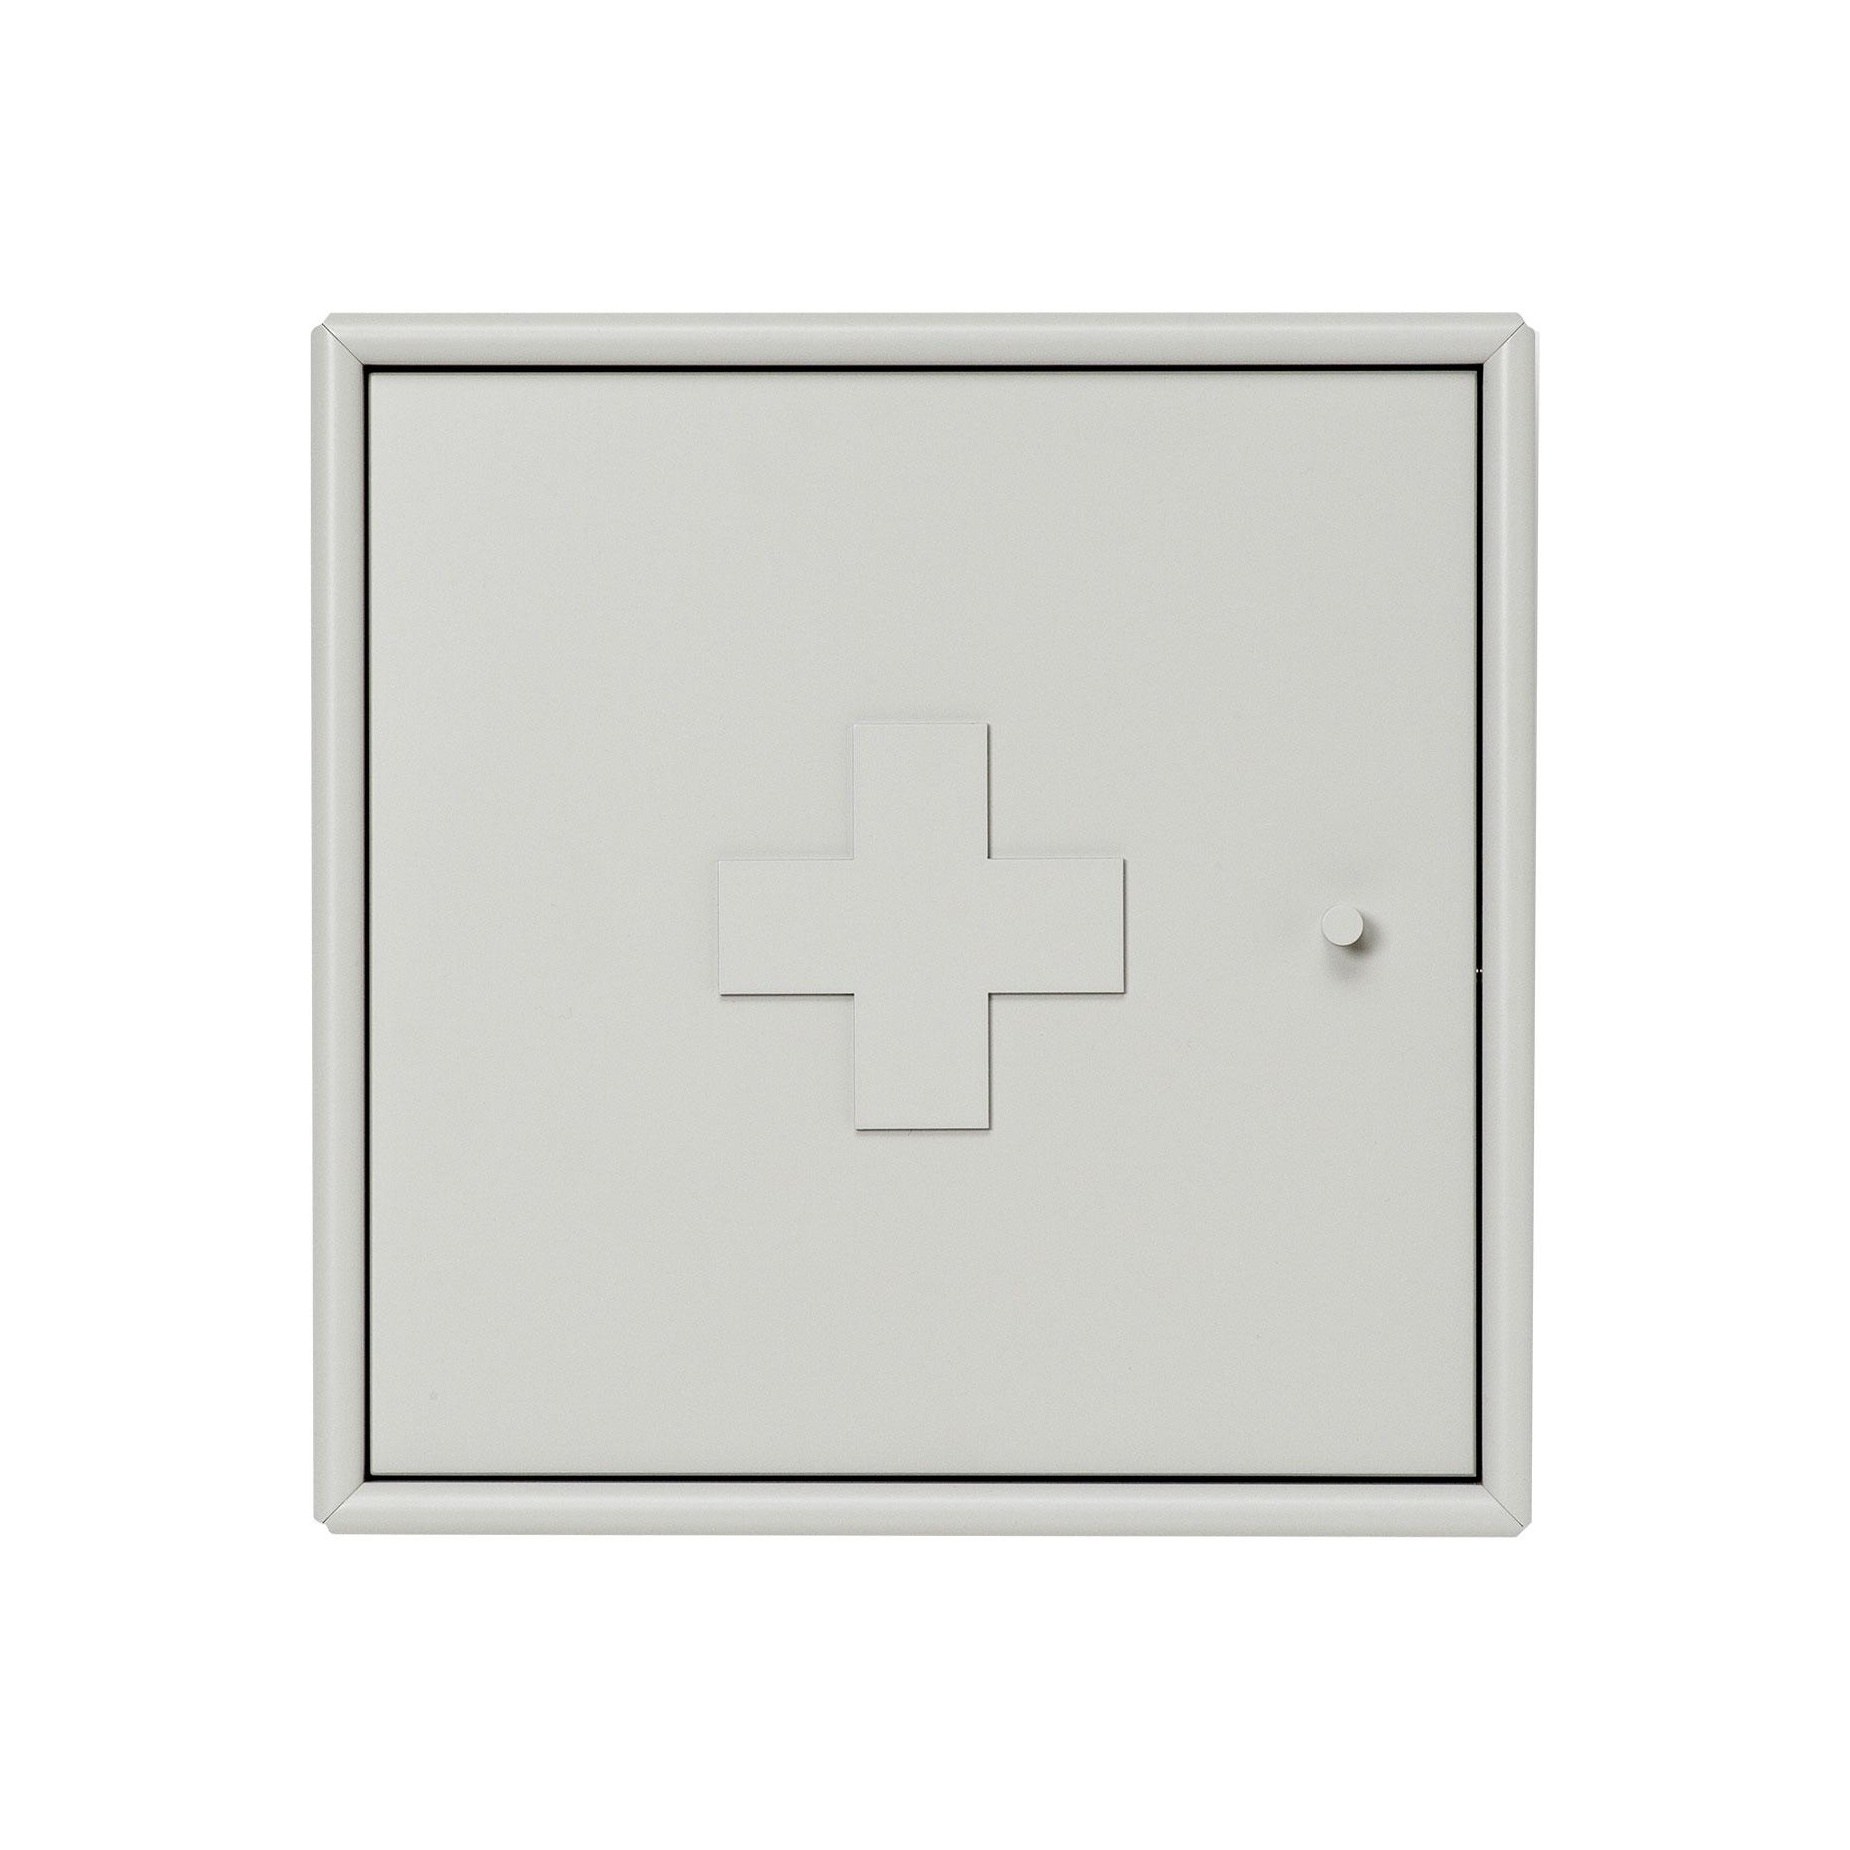 Montana - Aid Medizinschrank - nordic 09/lackiert/BxHxT 35|4x35|4x20cm/Incl. Wandaufhängung | Bad > Badmöbel > Medizinschränke | Montana